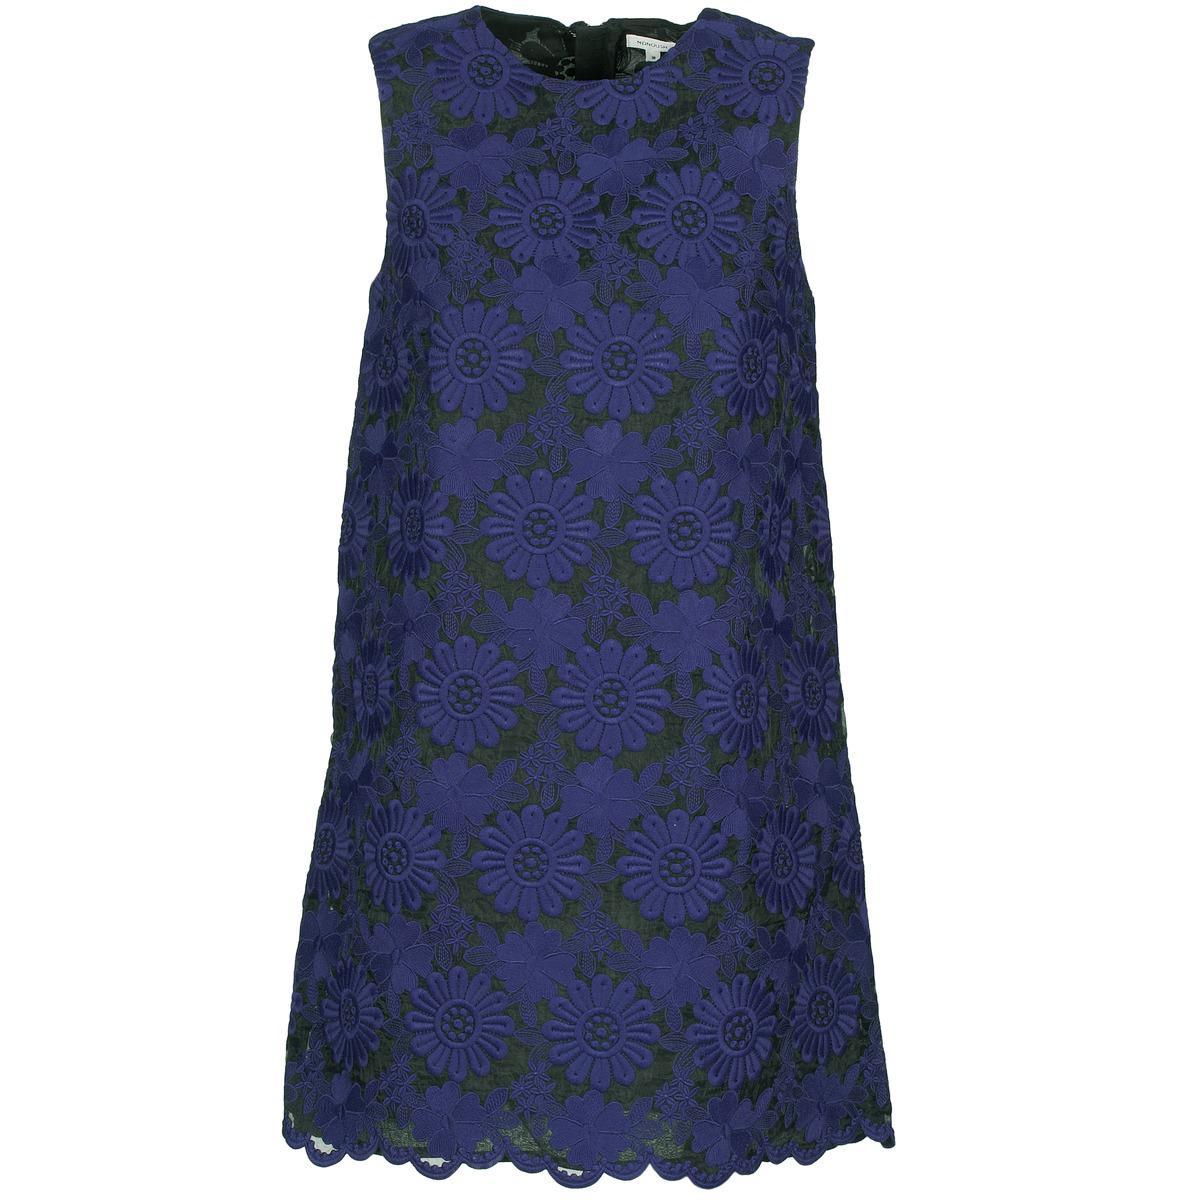 0d14cc61470 Manoush African Robe Women s Dress In Blue in Blue - Lyst